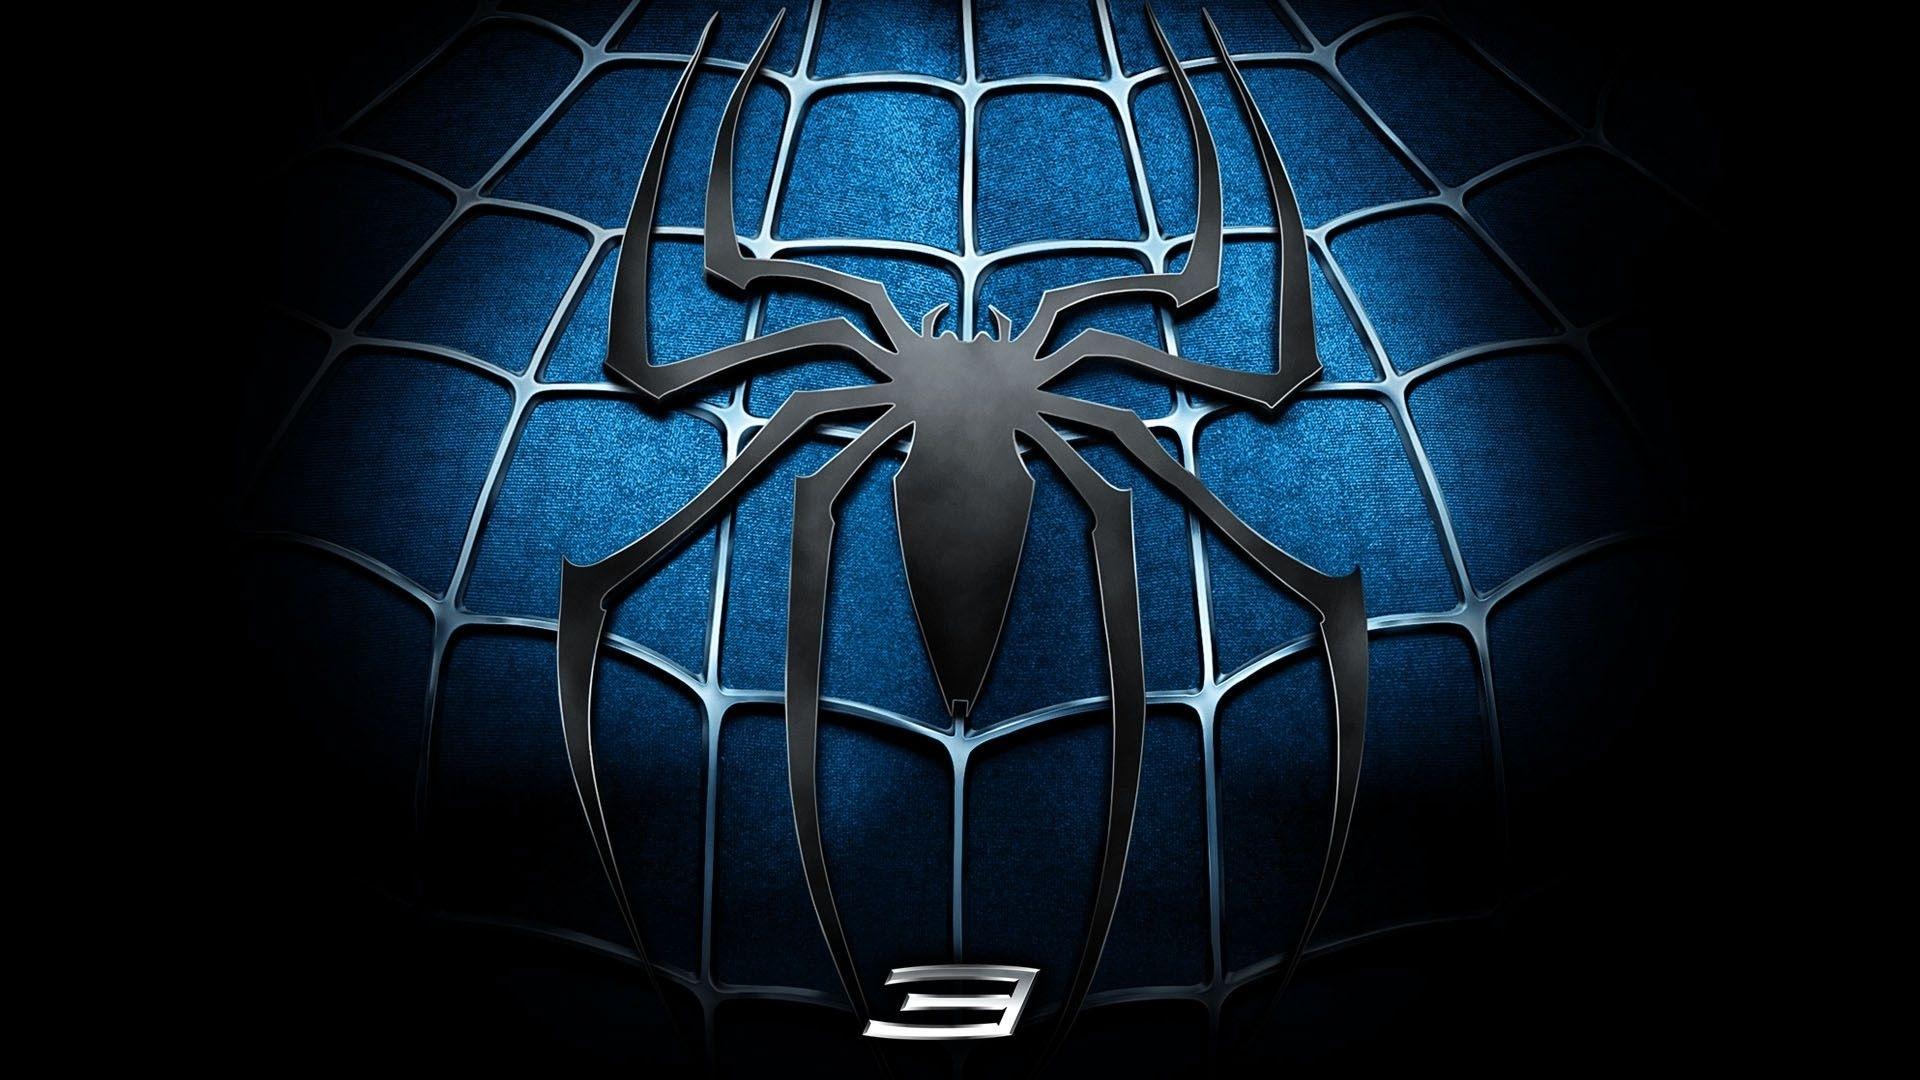 image for black spiderman logo wallpaper cool hd | cool | pinterest